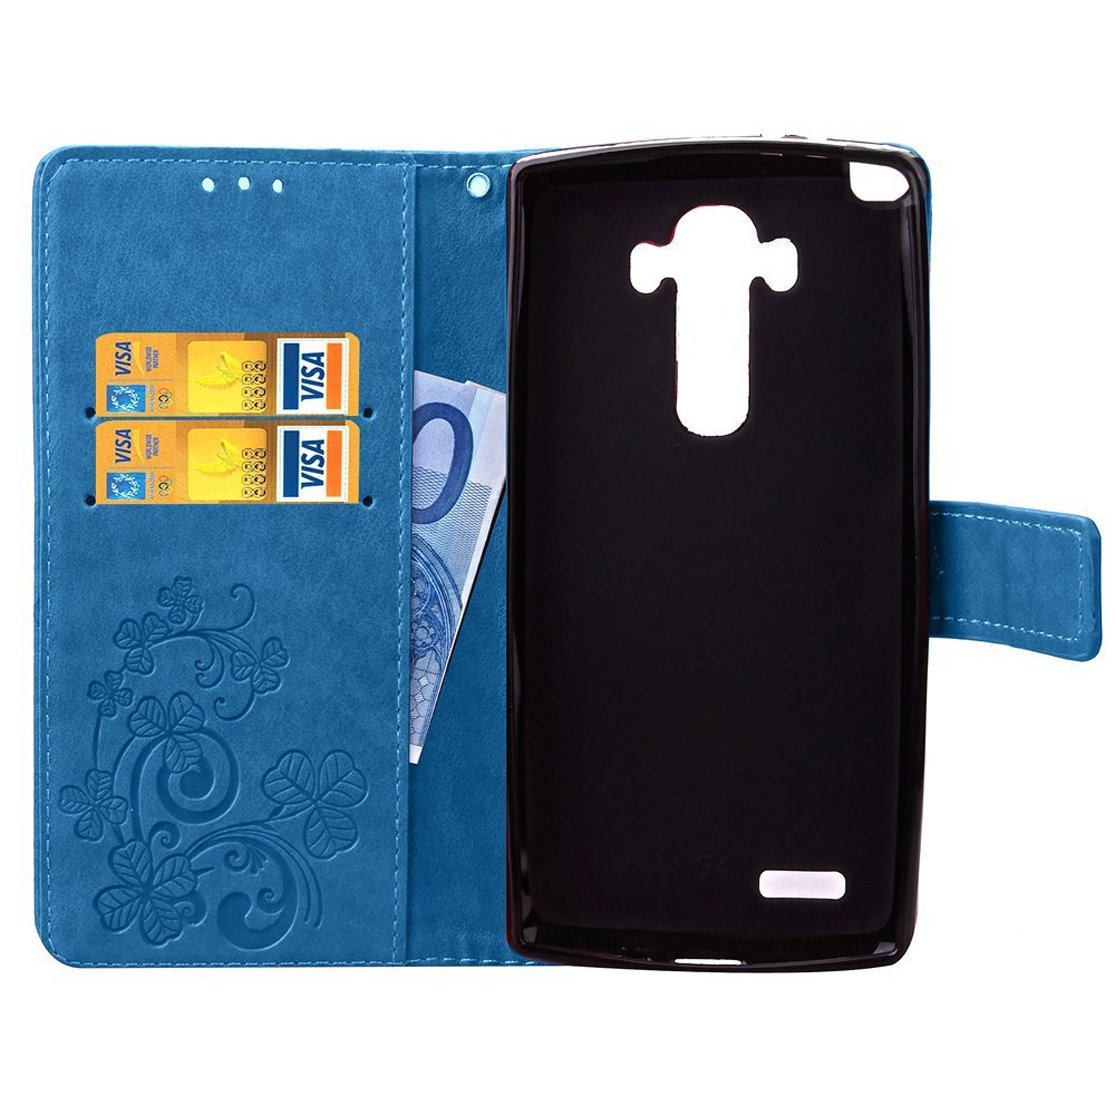 Amazon.com: LG G Stylo Funda, LG G4 Stylus Caso (no ...